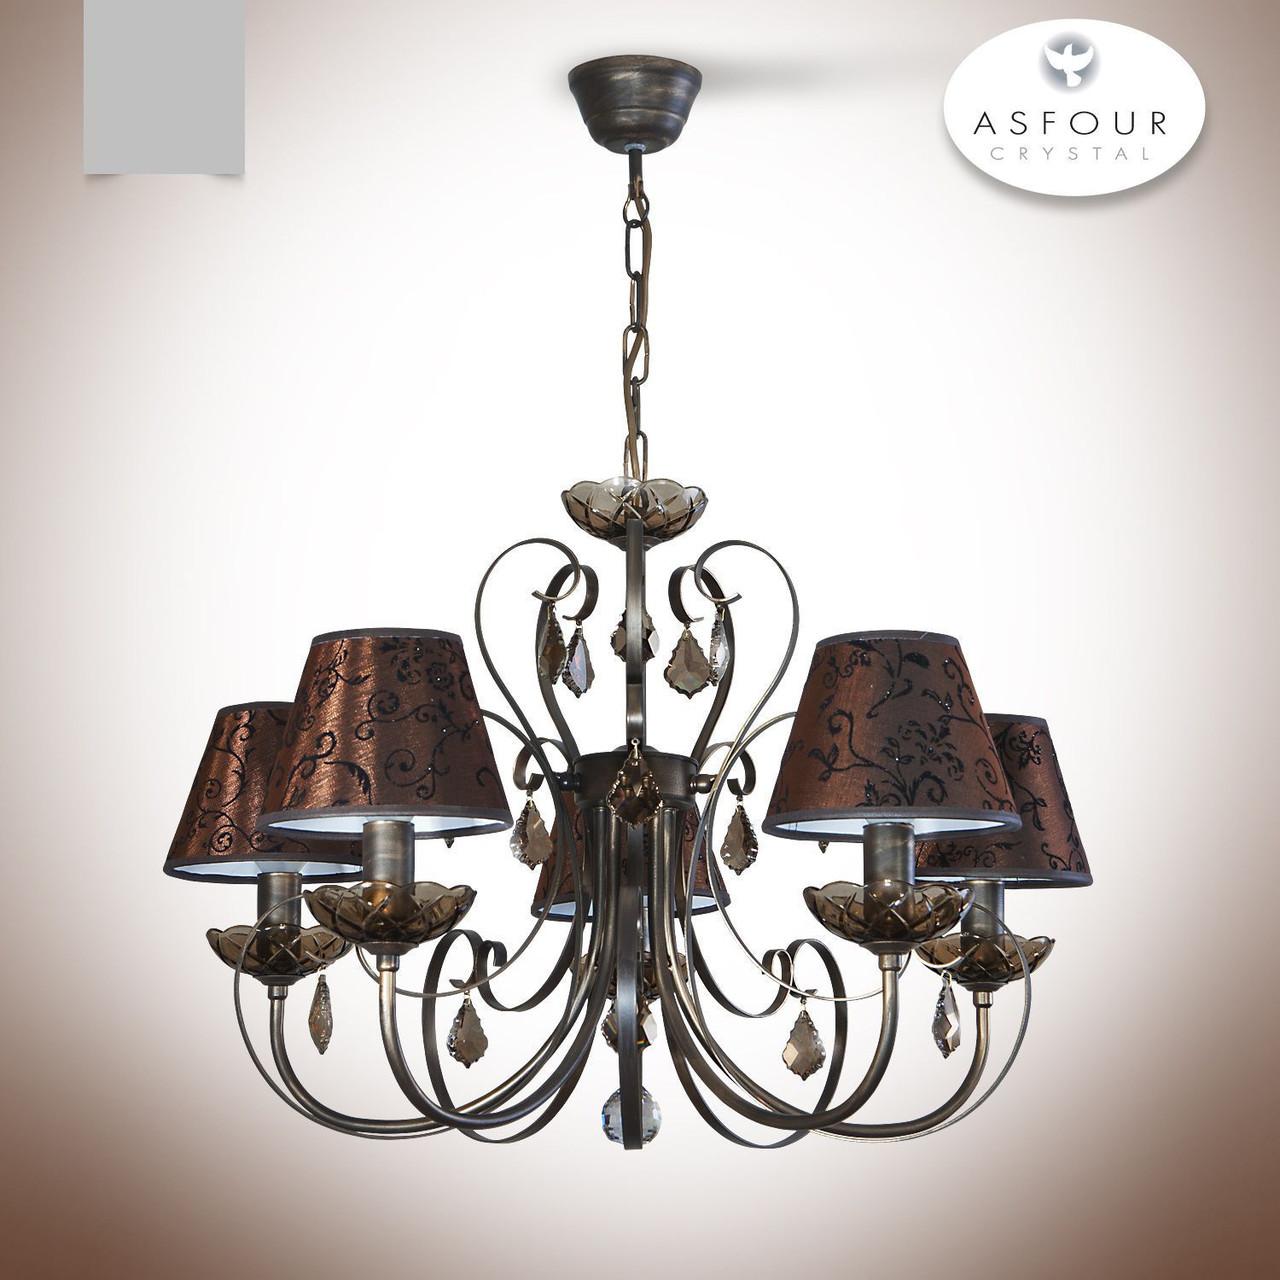 Люстра 5 ламповая с хрусталем и абажурами для зала, спальни, кабинета  12144-1